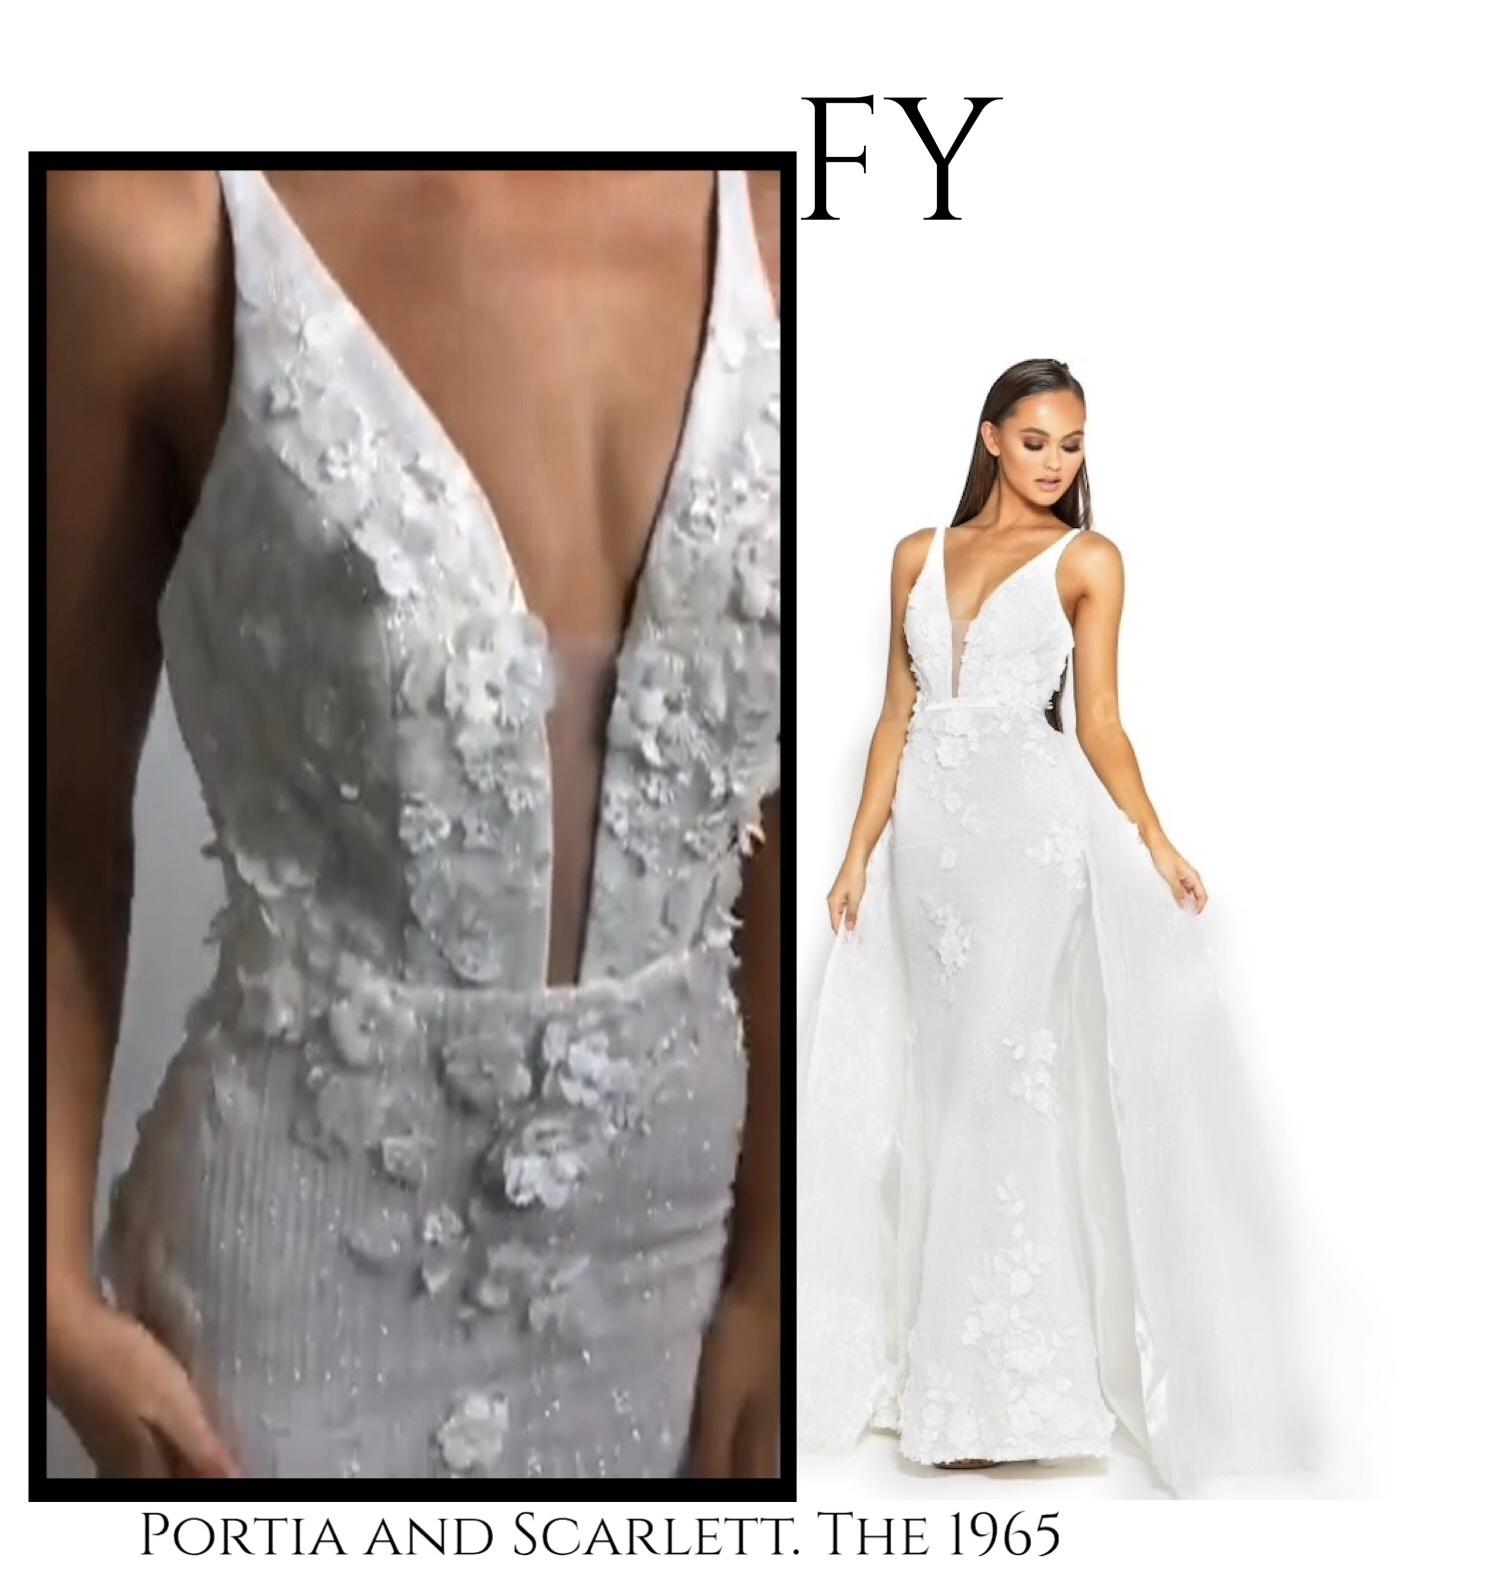 e201df32f9 Australian Wedding Reception Dresses - Fashionably Yours